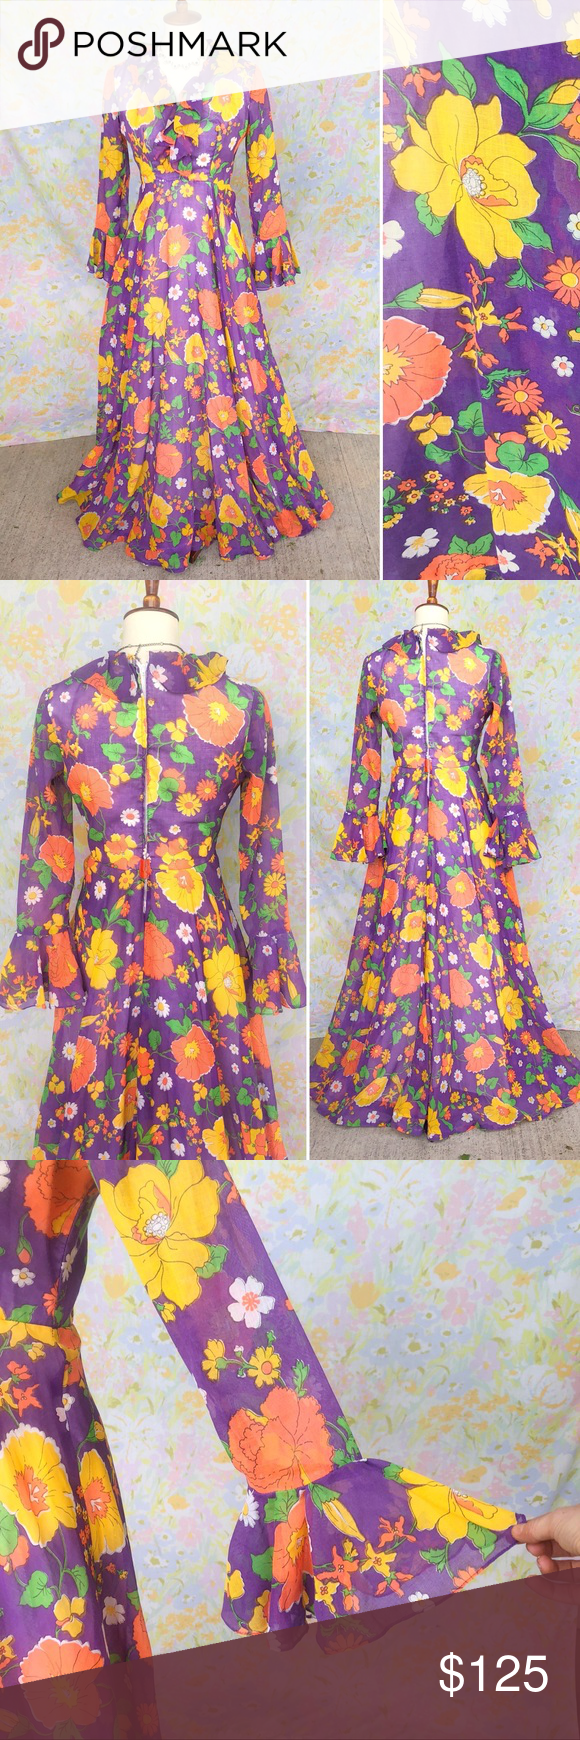 Sold Vintage 70s Psychedelic Floral Maxi Dress Floral Maxi Dress Dresses Vintage Dresses [ 1740 x 580 Pixel ]